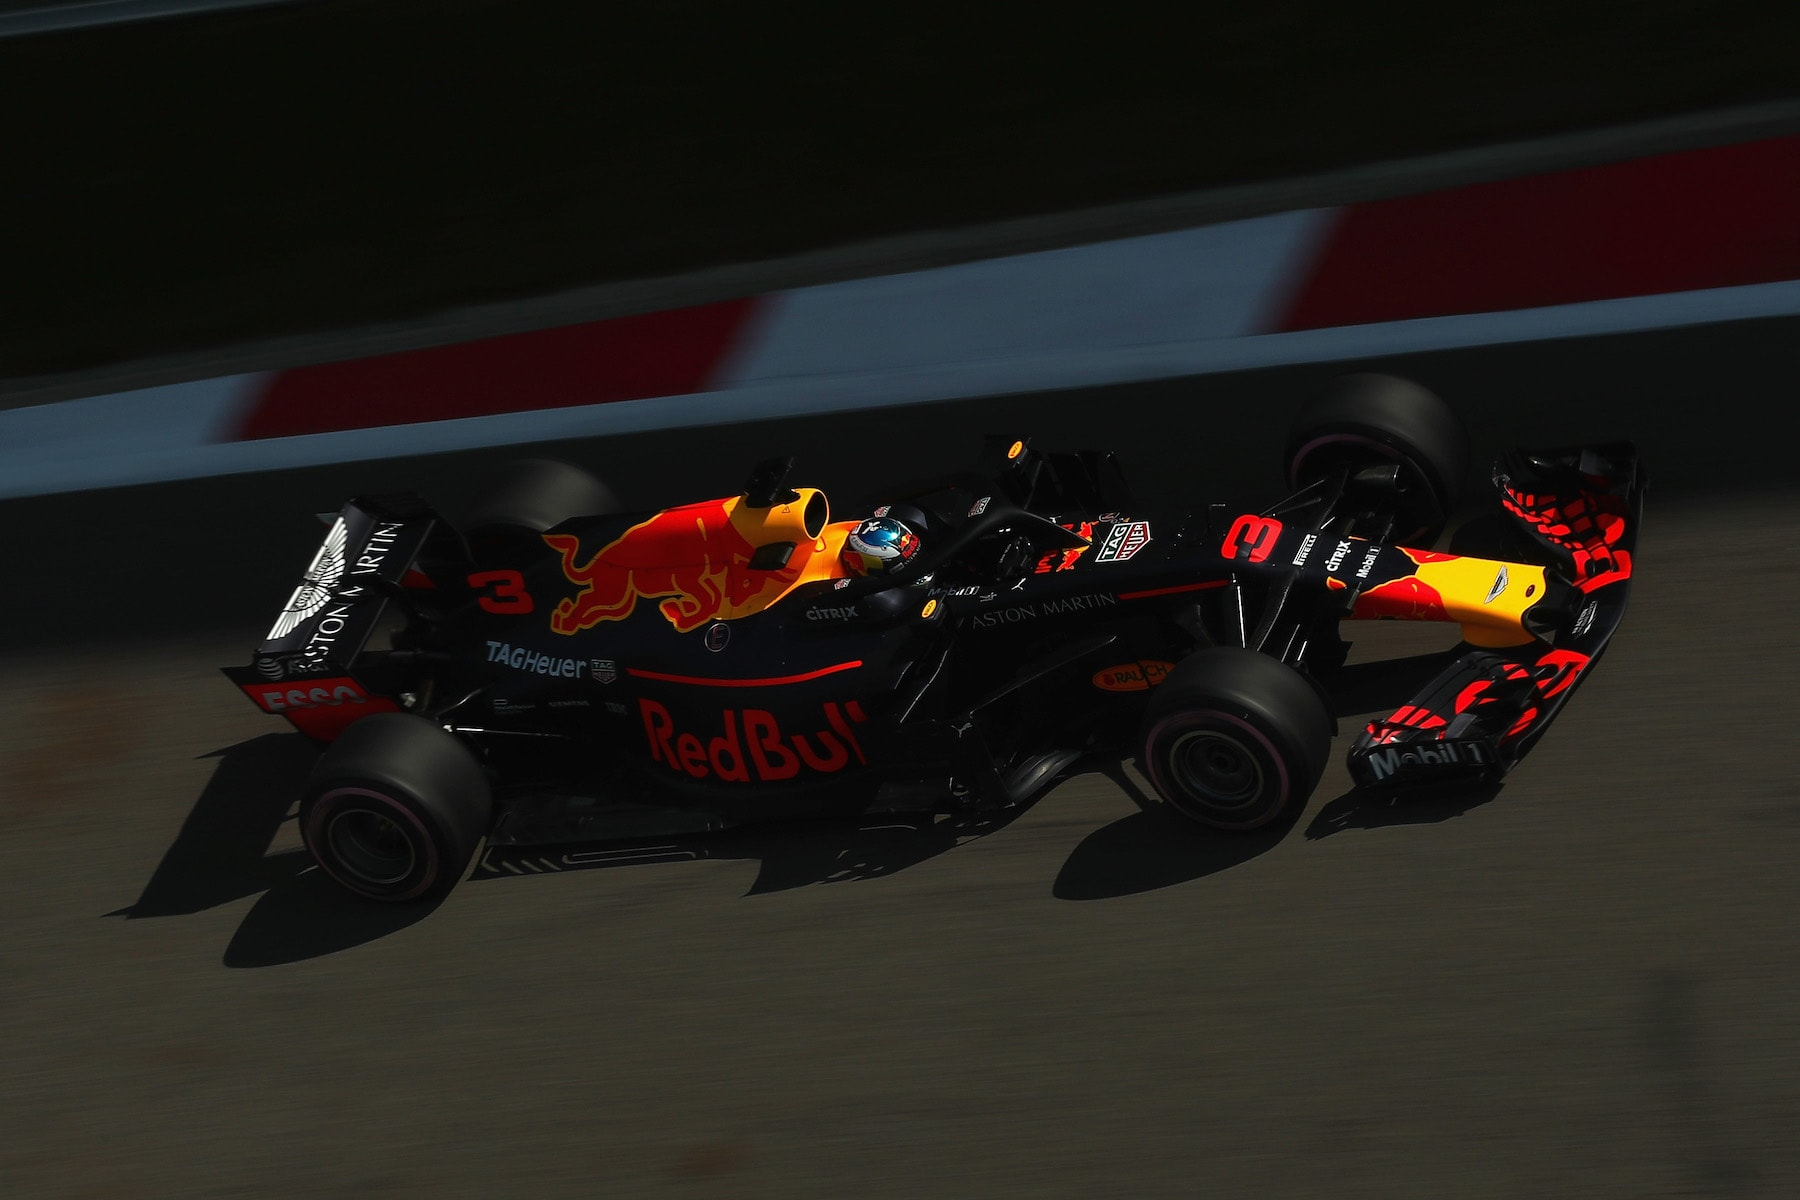 2018 Daniel Ricciardo | Red Bull RB14 | 2018 Russian GP Q1 2 Photo by Clive Rose copy.jpg